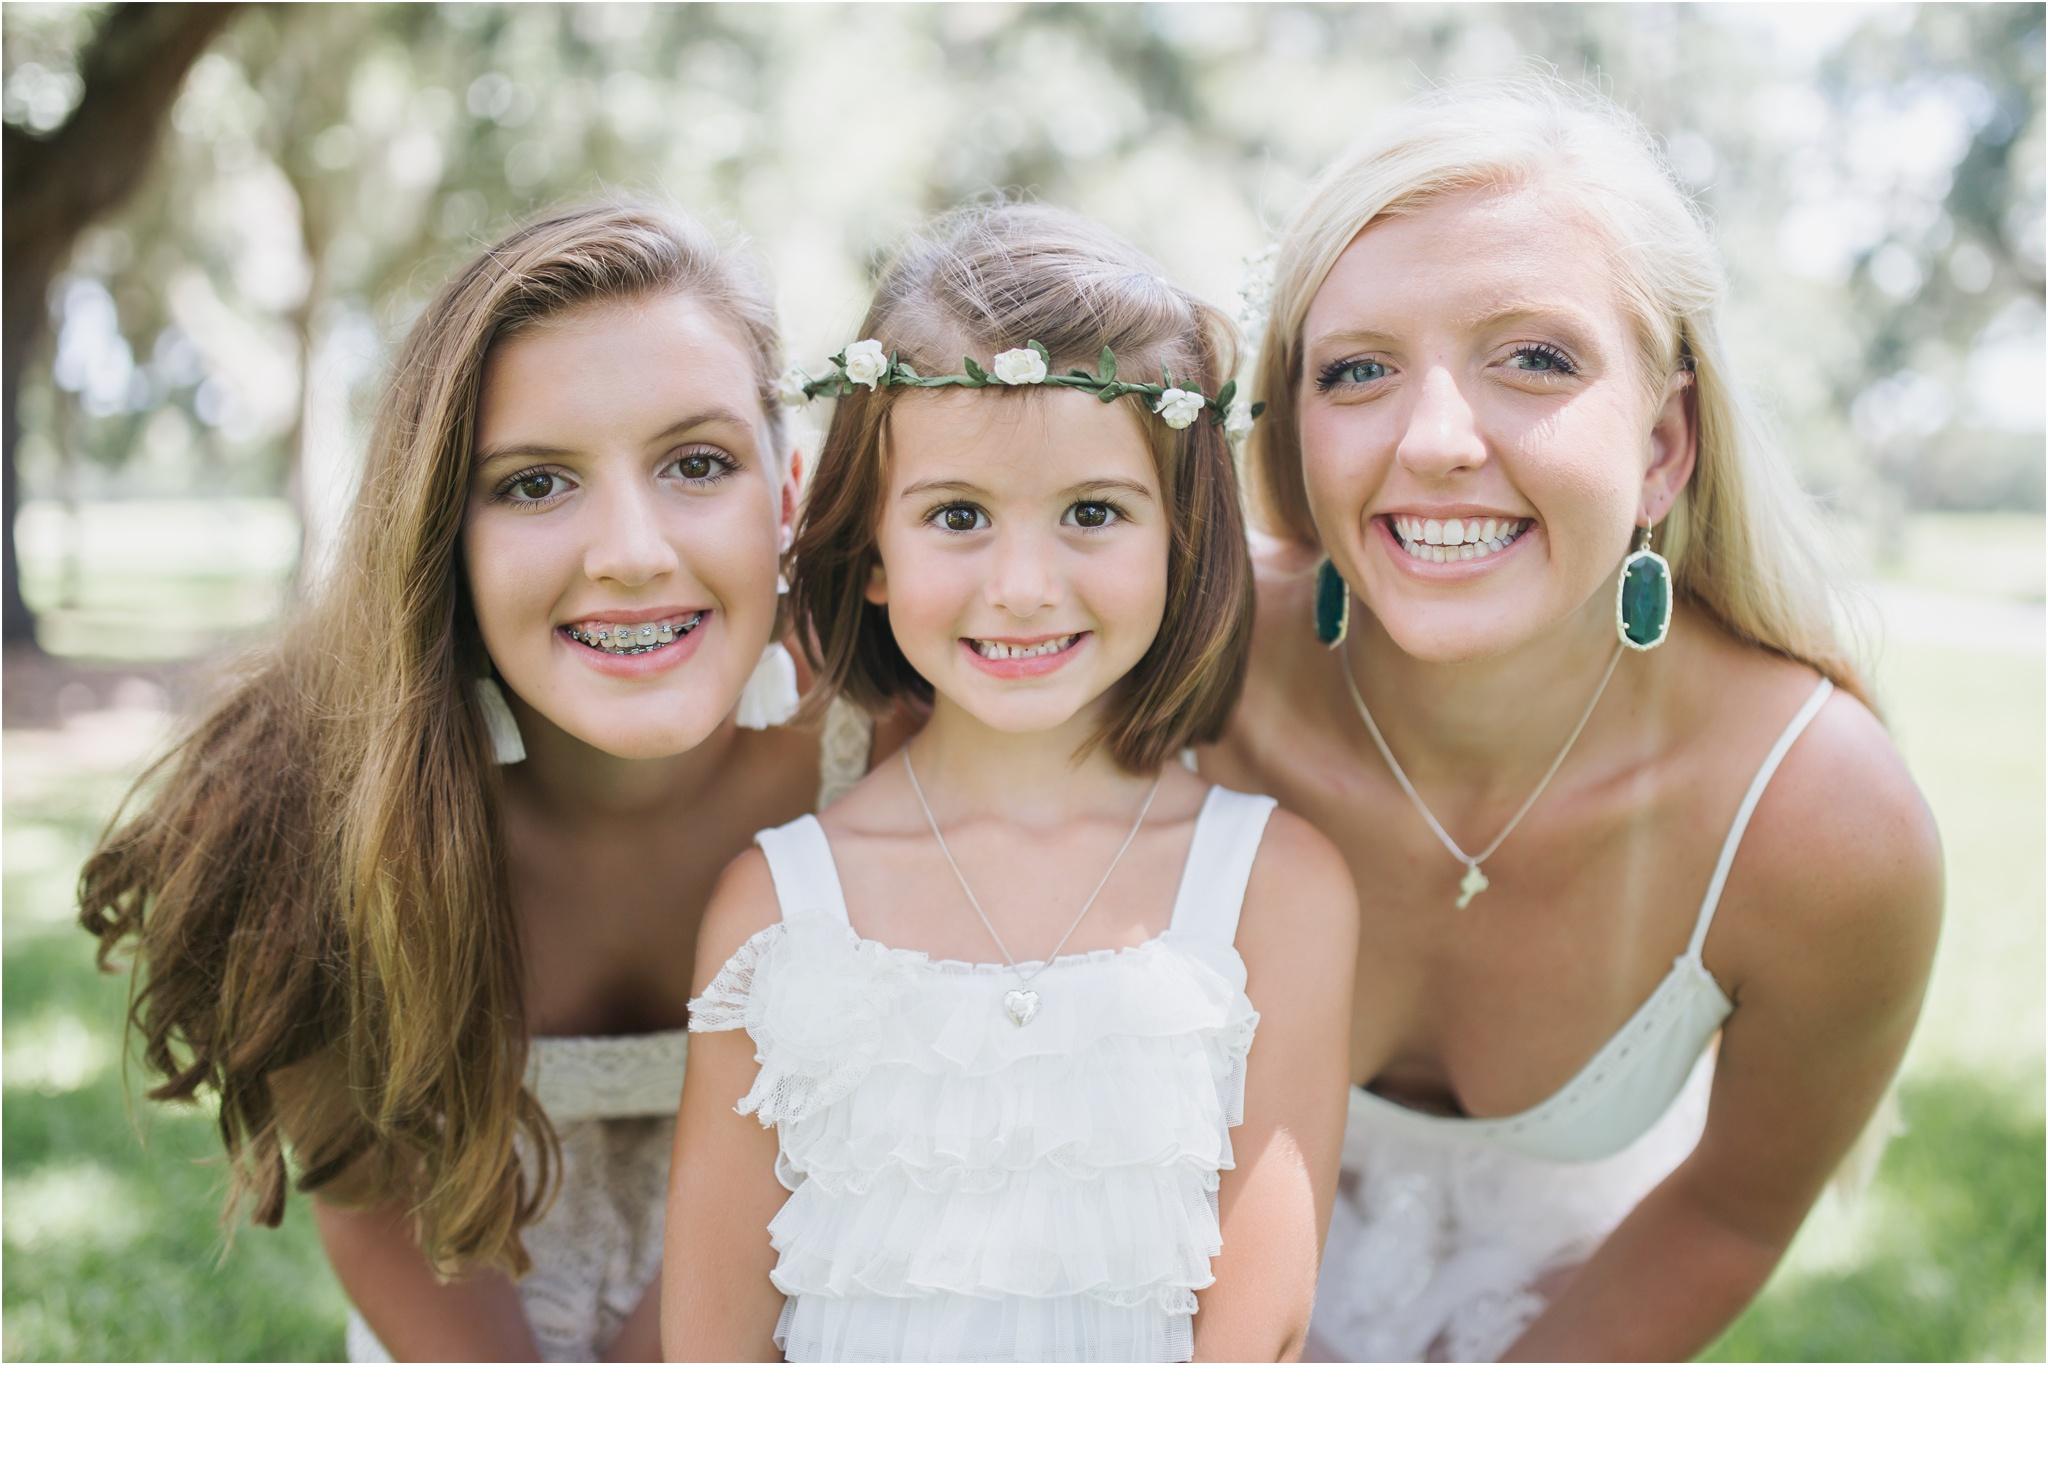 Rainey_Gregg_Photography_St._Simons_Island_Georgia_California_Wedding_Portrait_Photography_1103.jpg